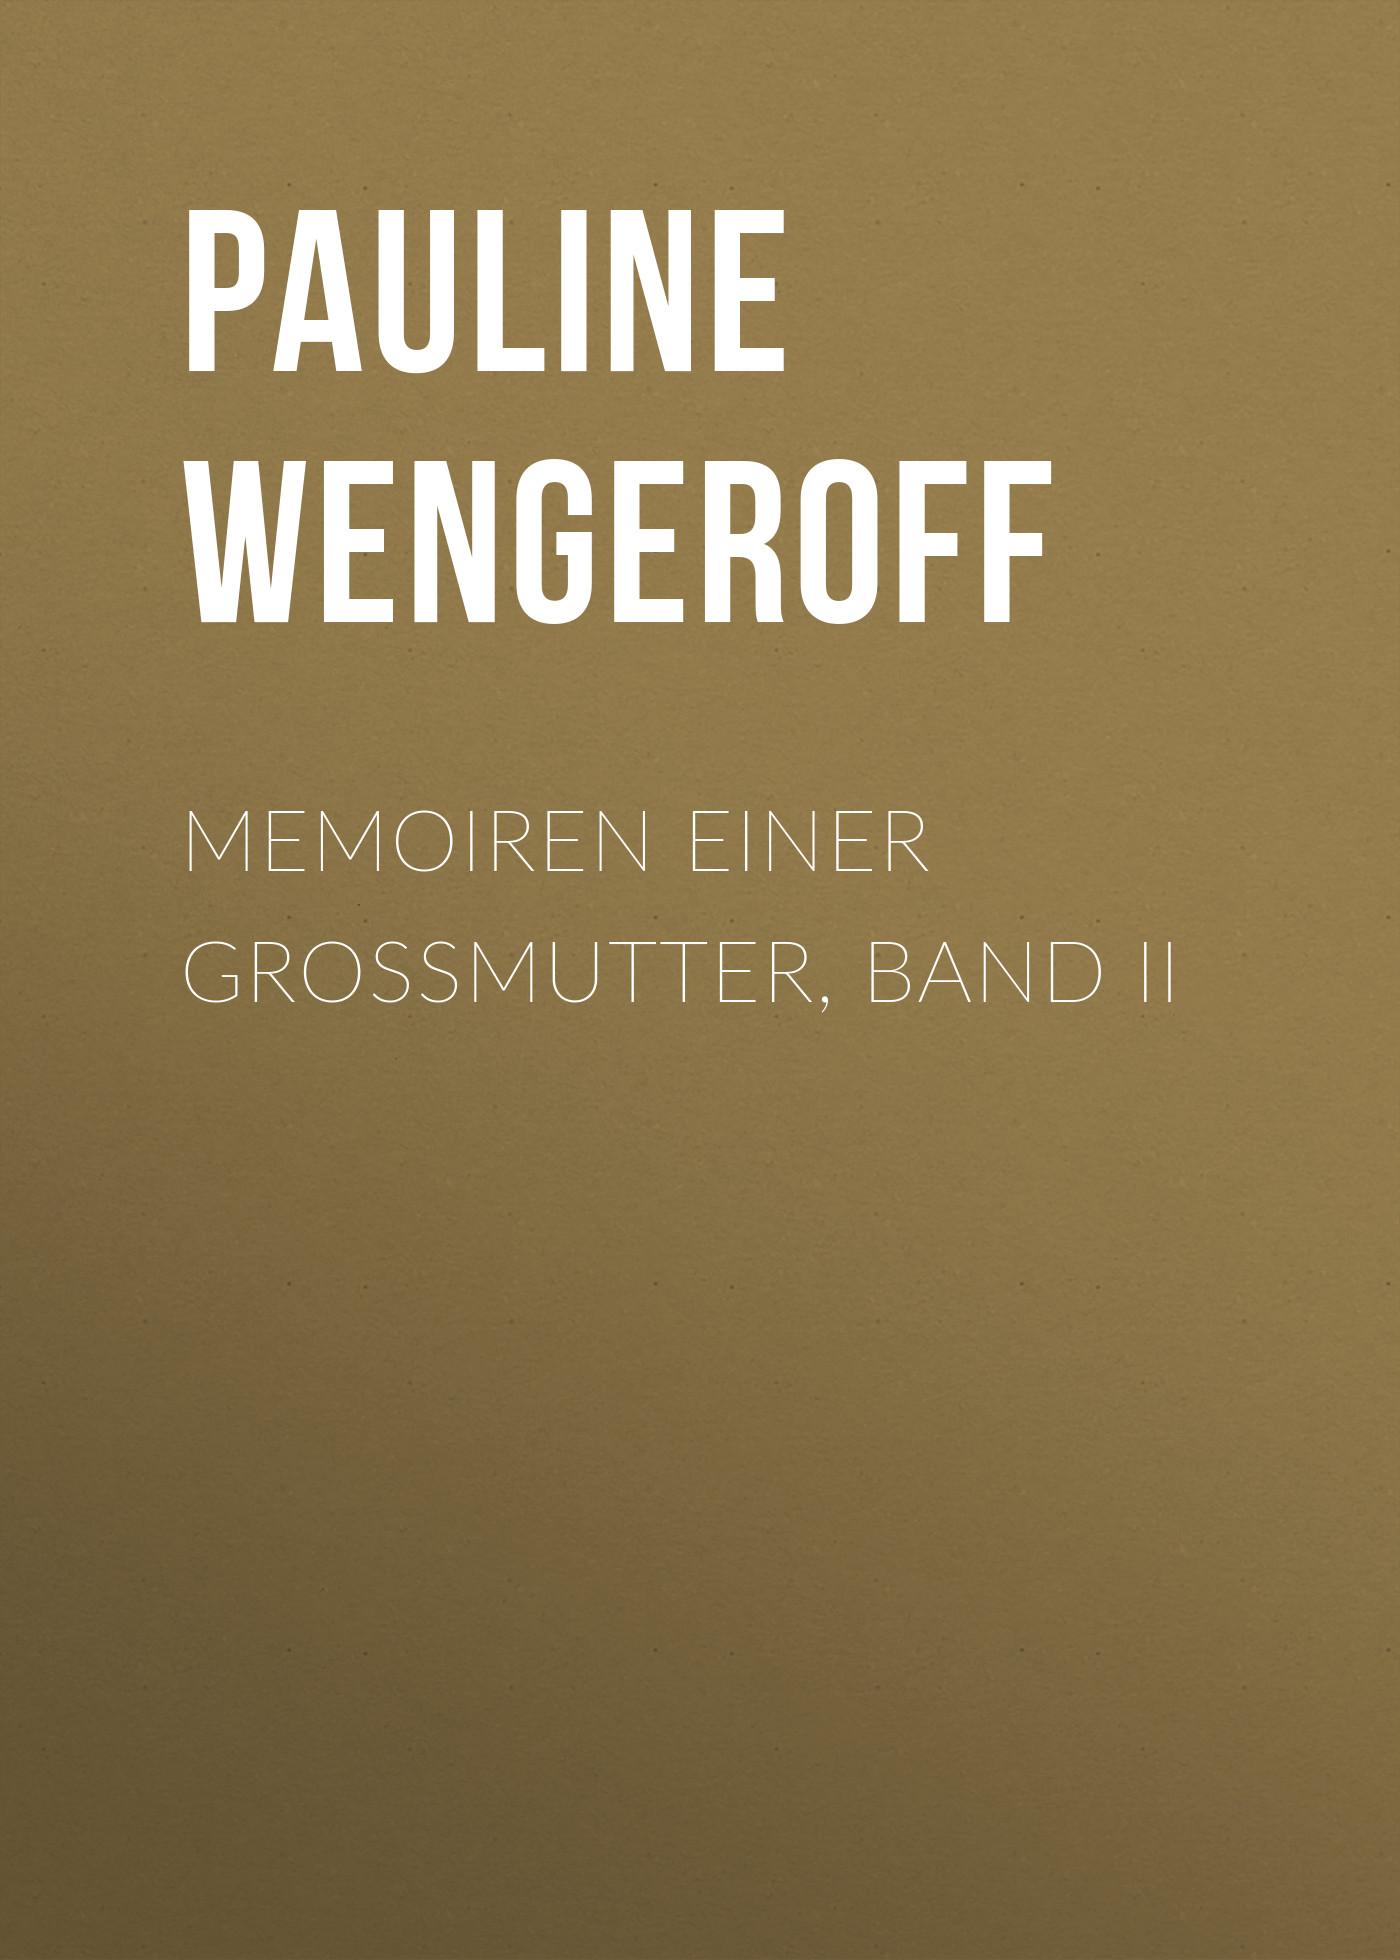 Pauline Wengeroff Memoiren einer Grossmutter, Band II pauline